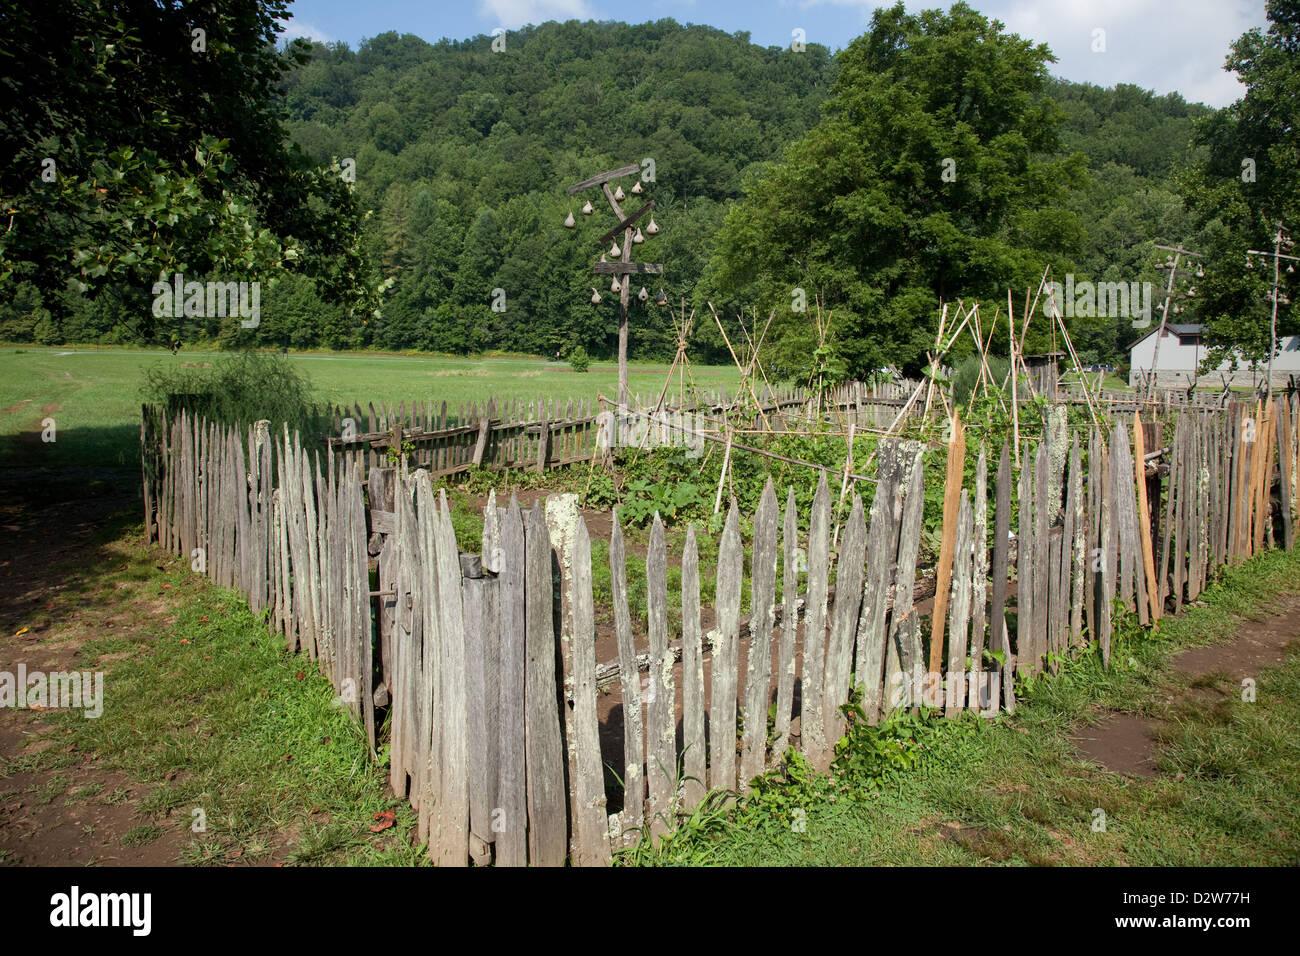 Garden Fence Trees Stockfotos & Garden Fence Trees Bilder Alamy